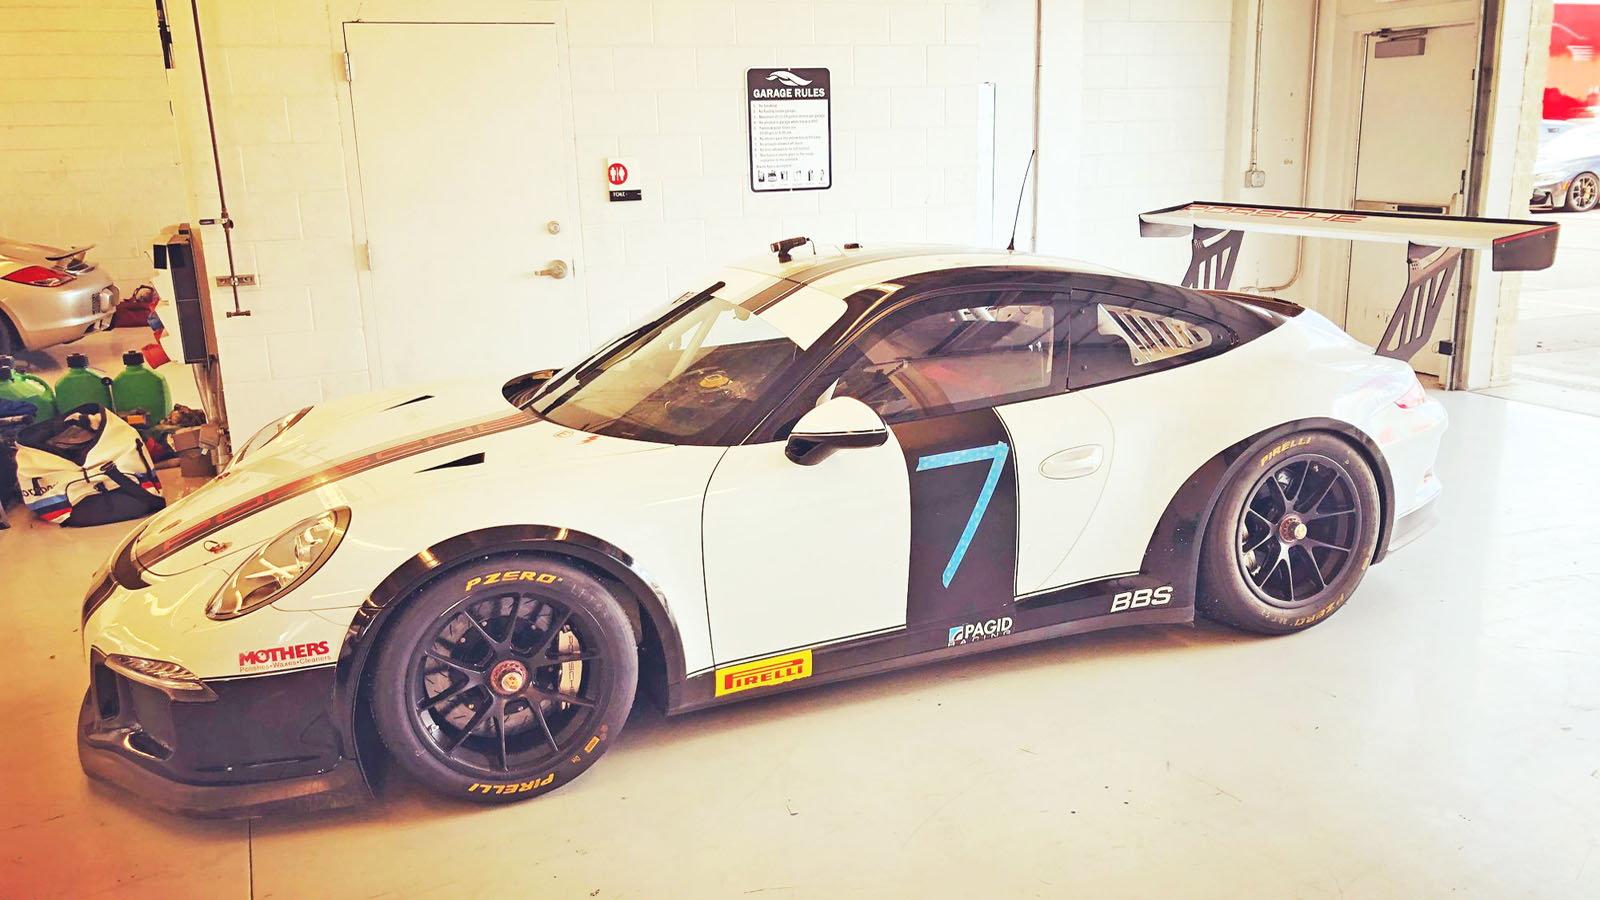 Will the New Program from Dieter Heinz Bring More Success to Porsche?